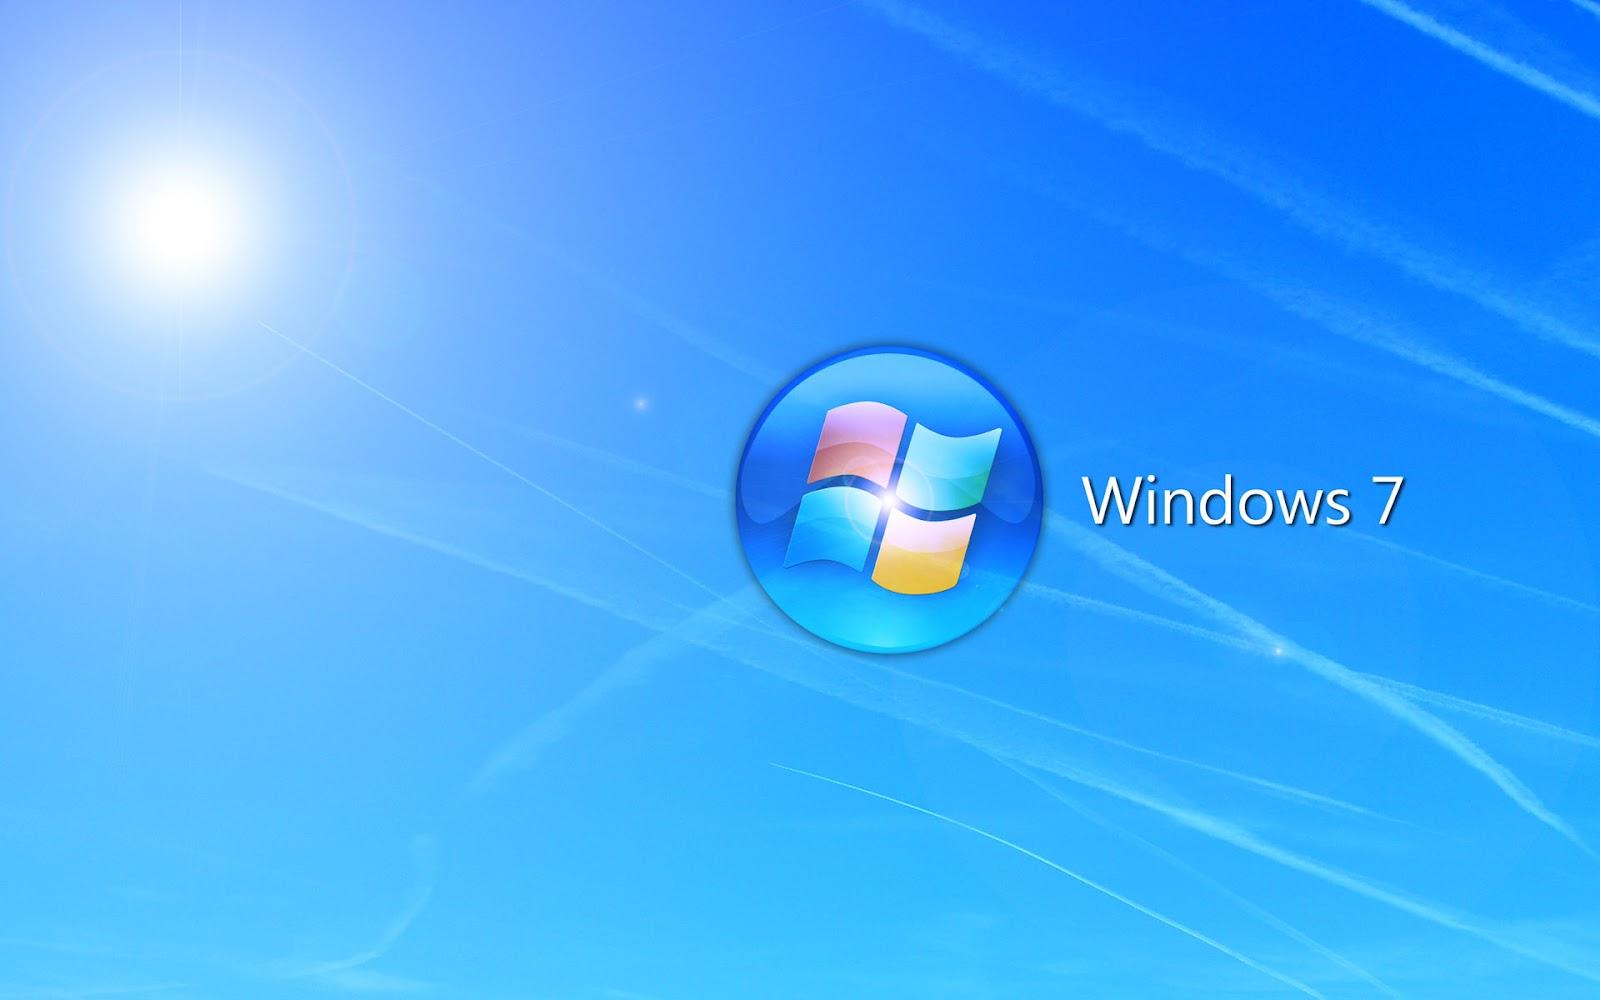 Windows 7 HD Beautiful Wallpapers - HD Wallpapers